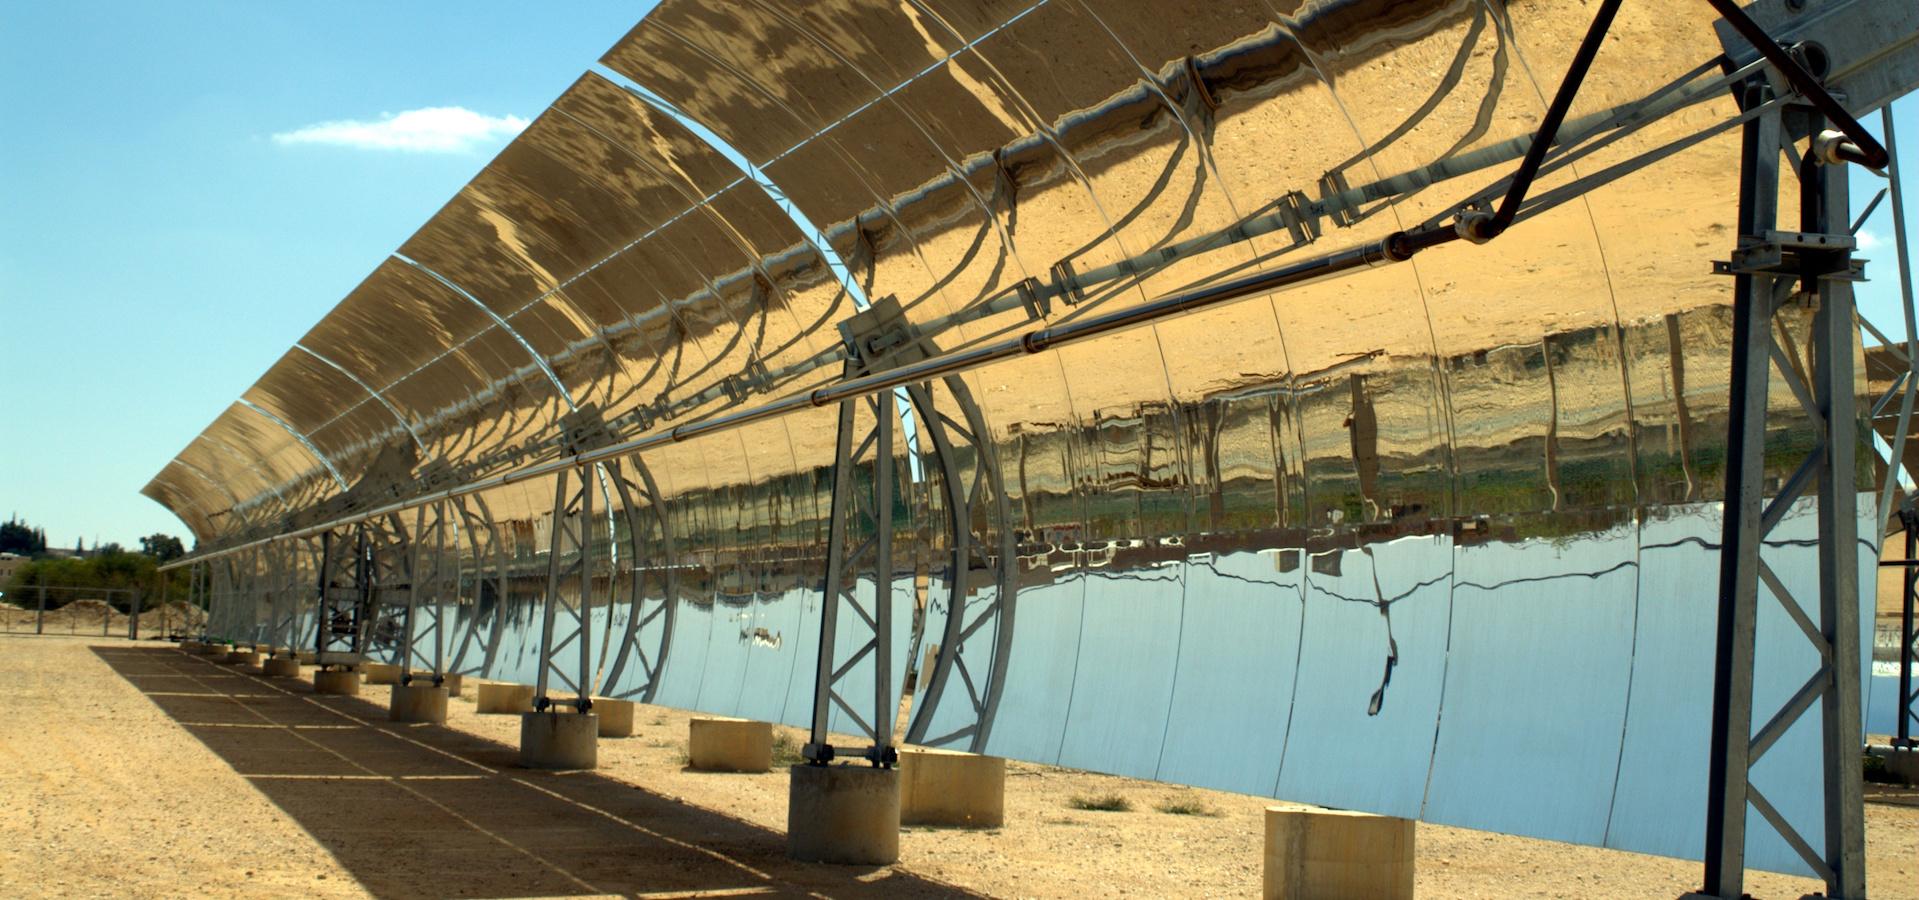 Solar Troughs in the Negev desert of Israel